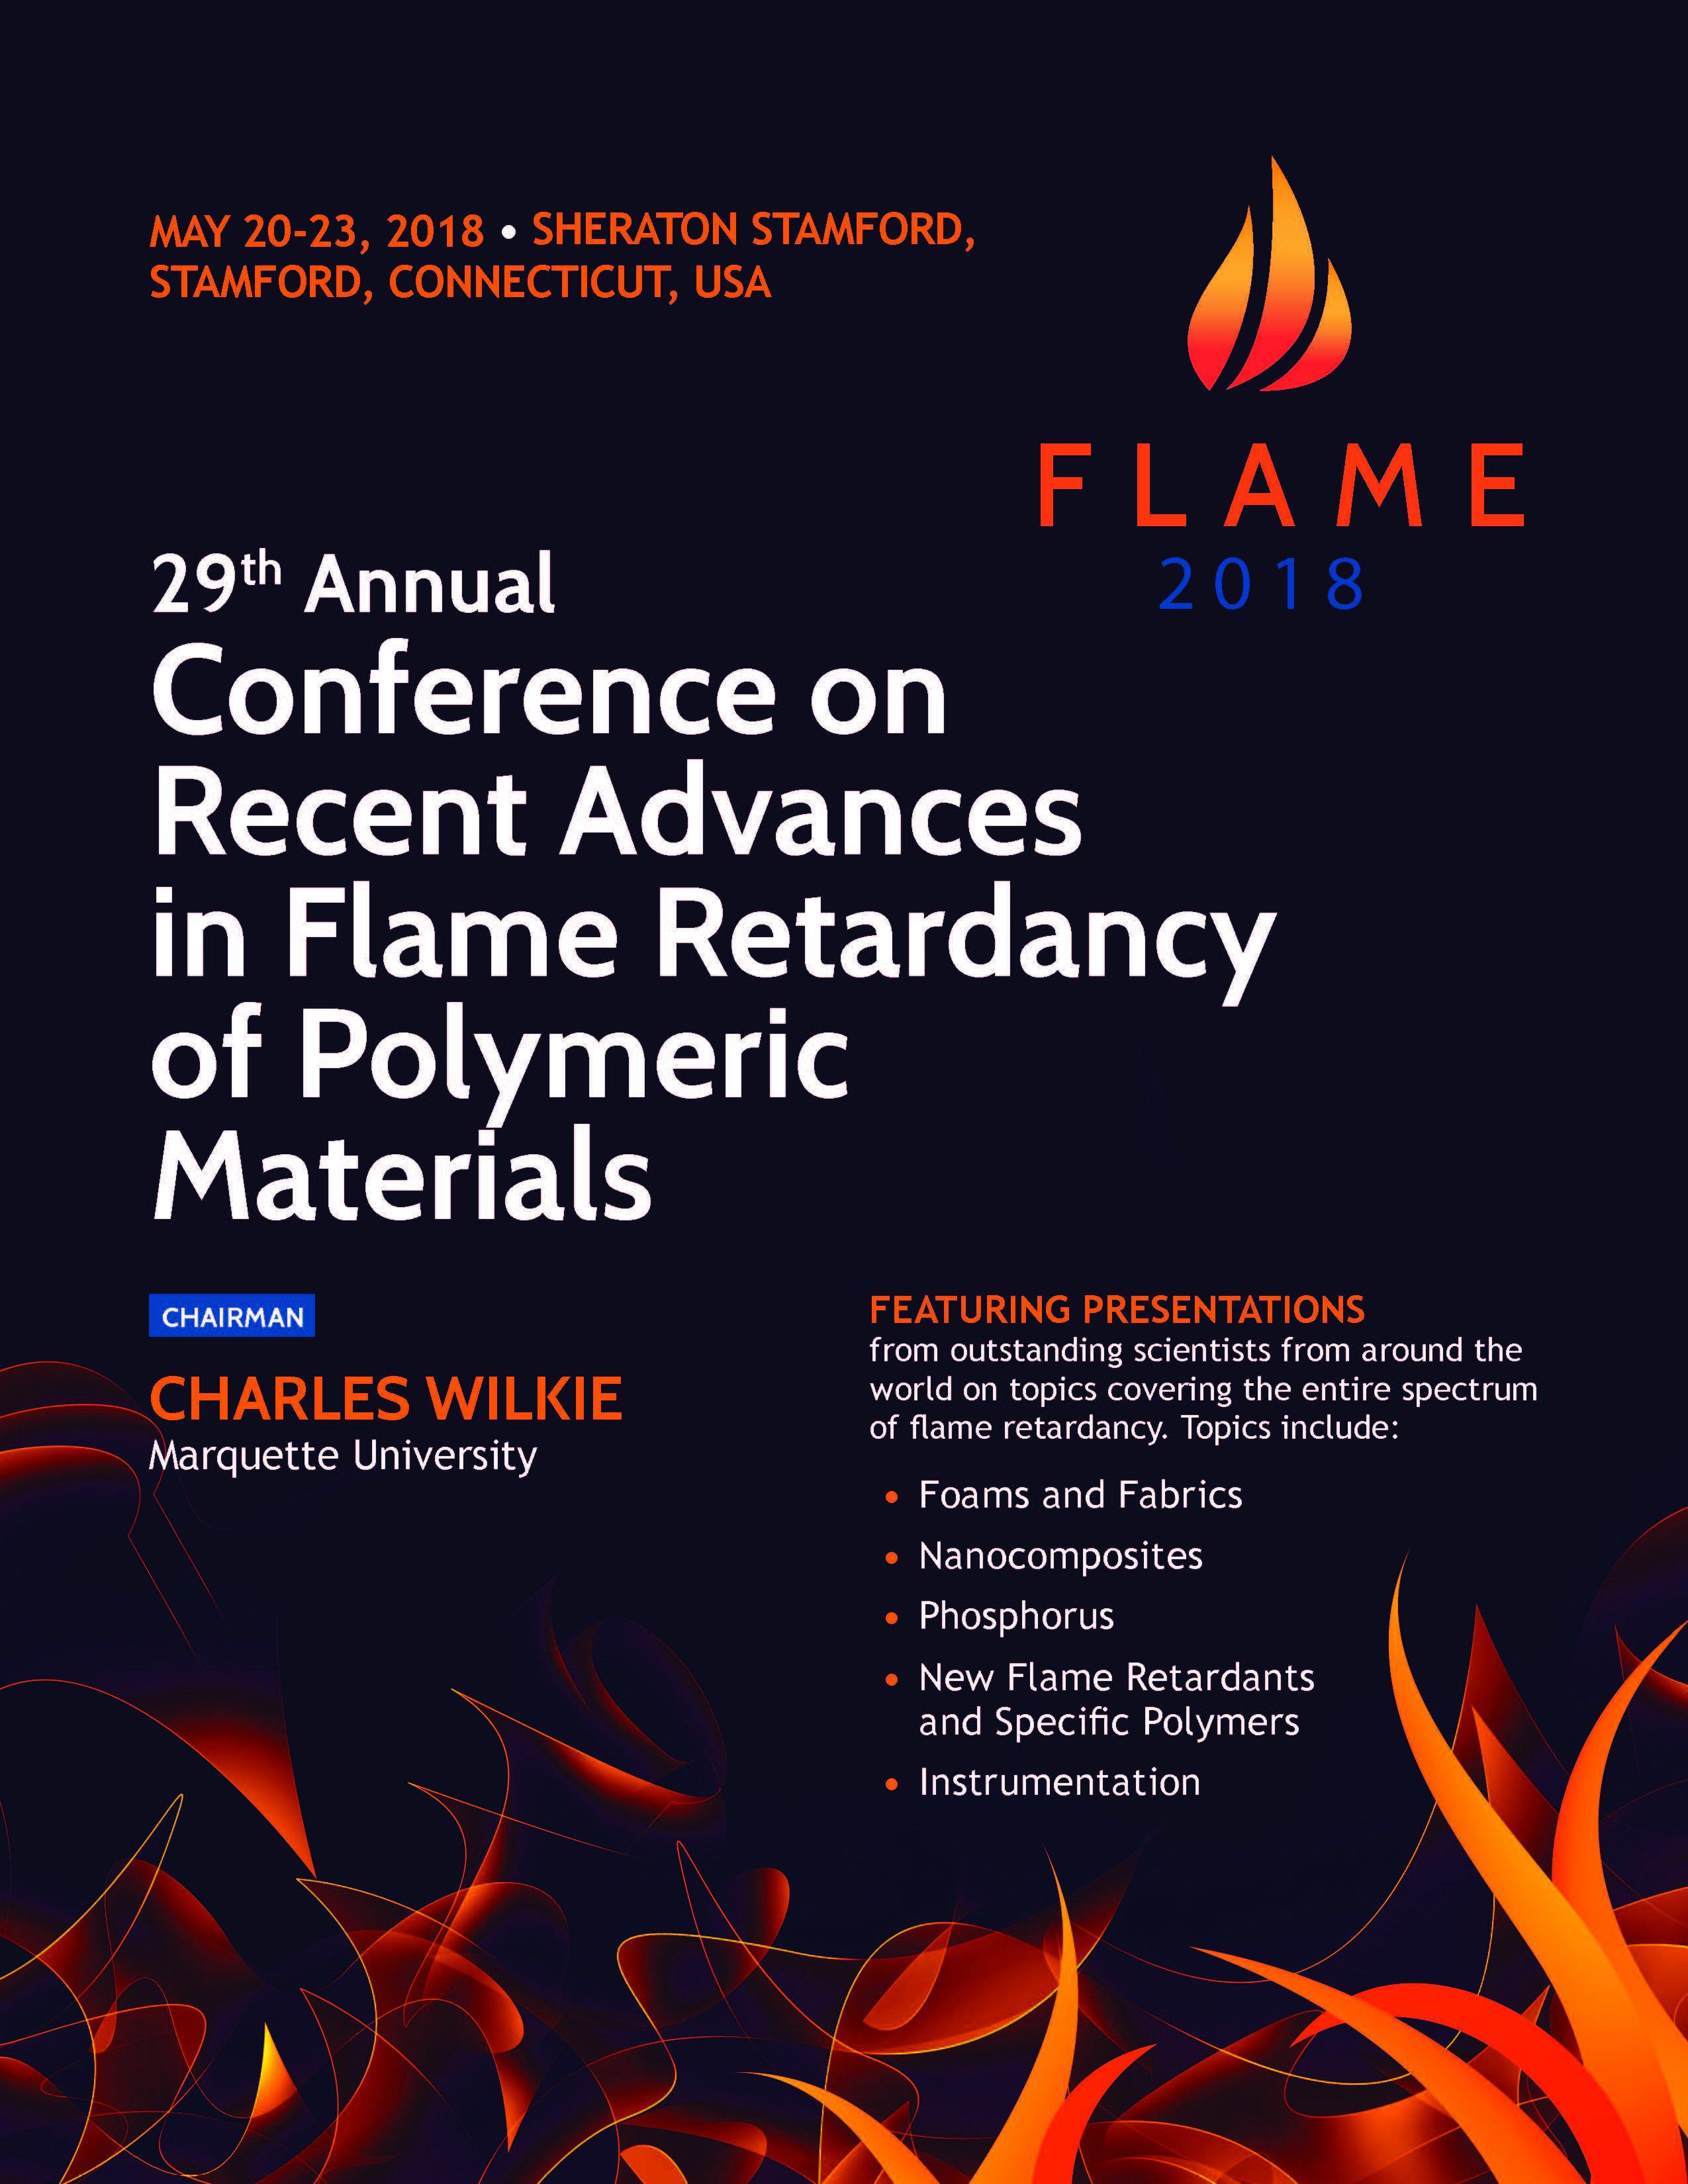 flame 2018 program_Page_01.jpg